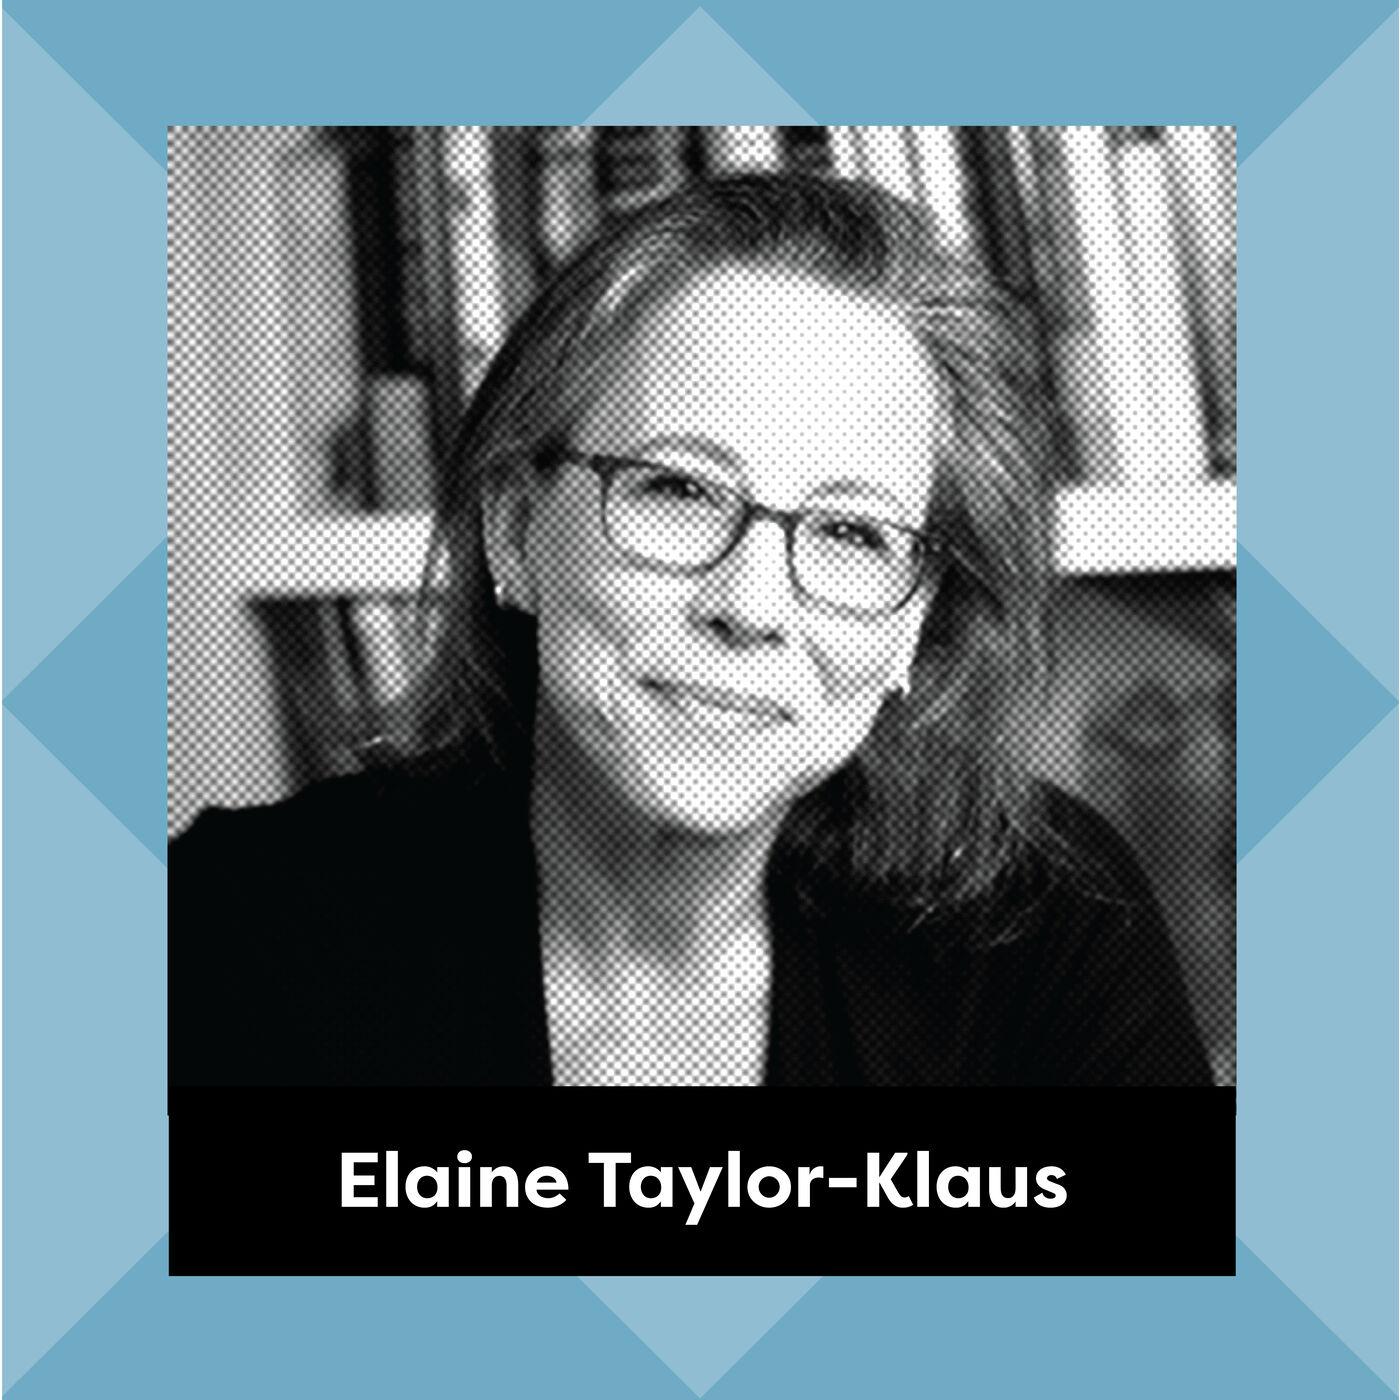 Ep. 125: Elaine Taylor-Klaus - Sideways Stories of Complex Kids